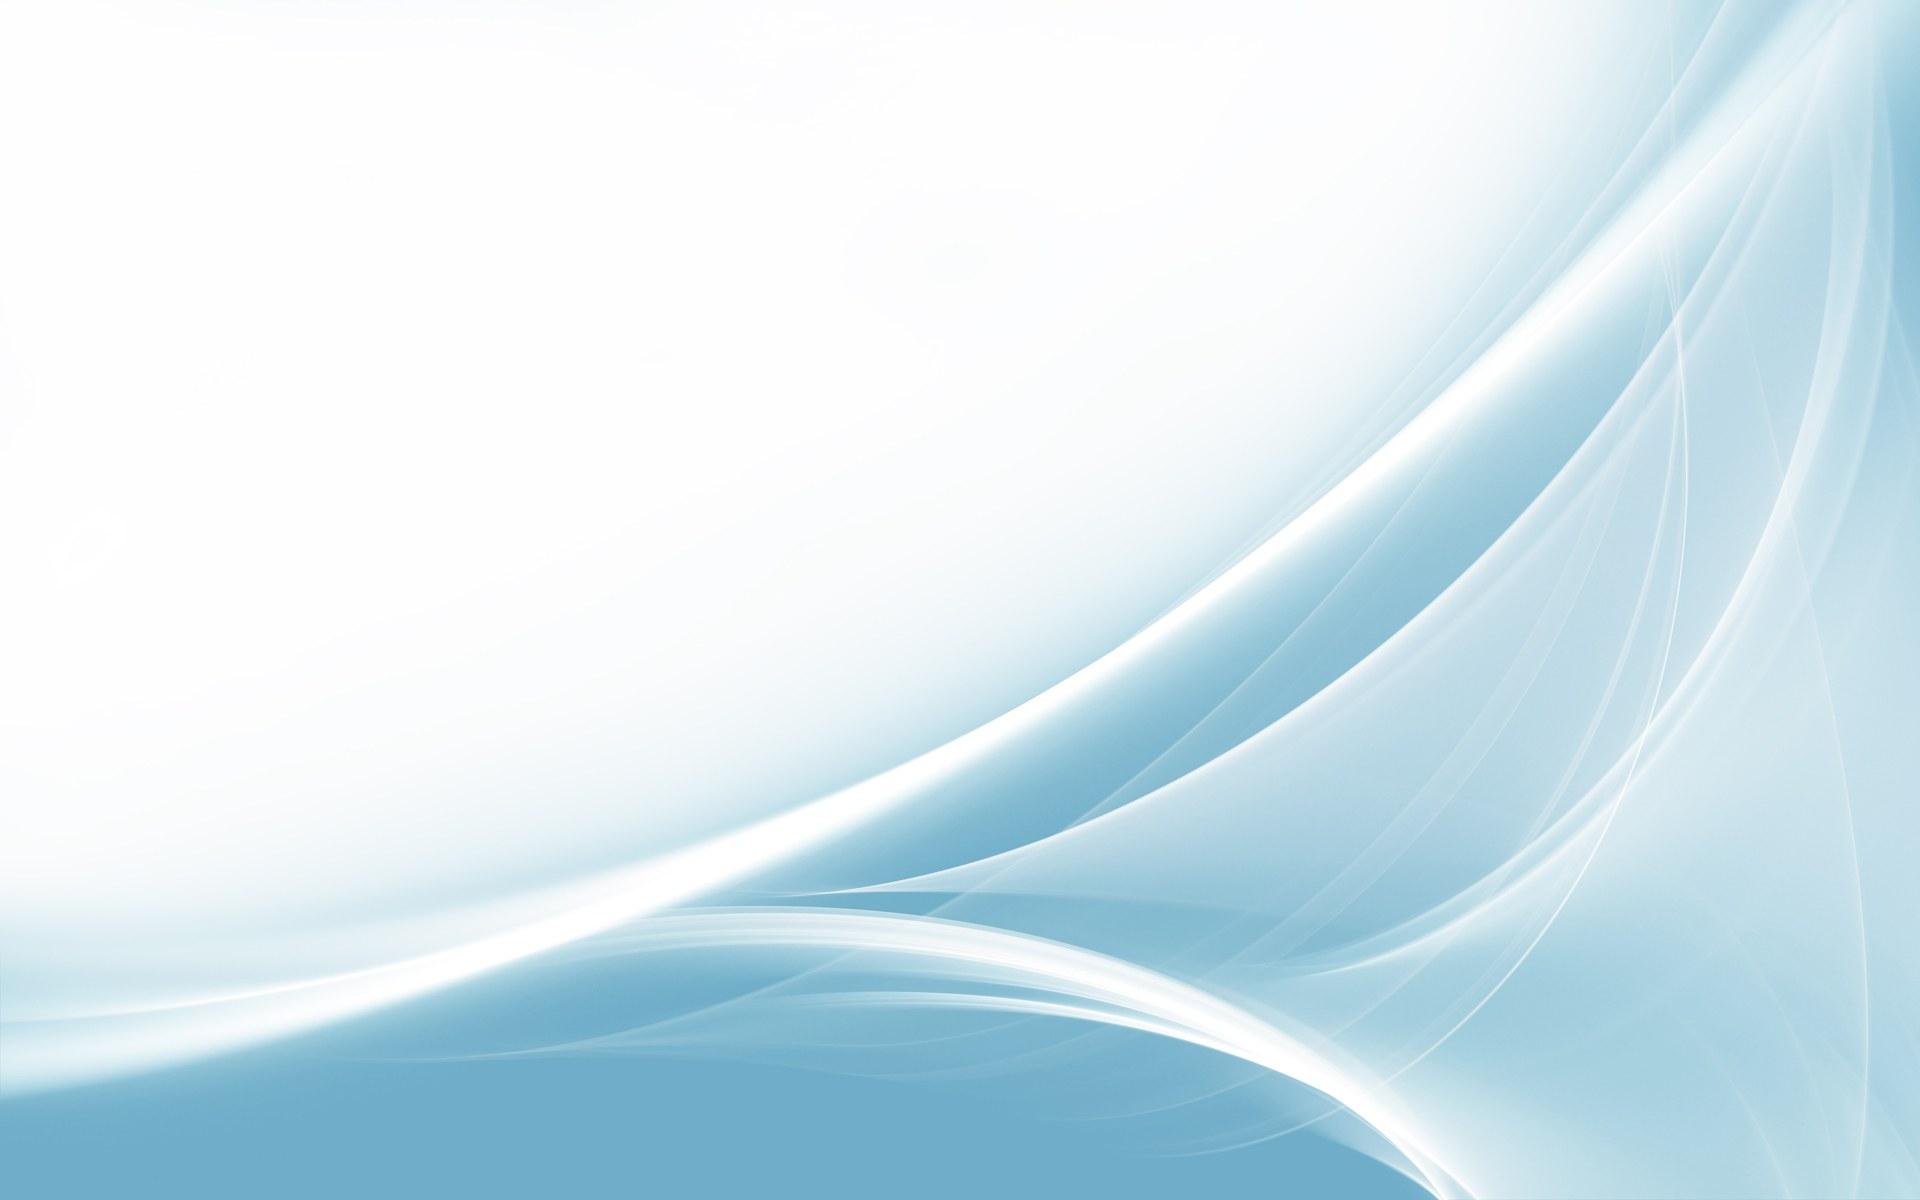 Blue Background   Blue Abstract Light Effect 19201200 NO31 Wallpaper 1920x1200